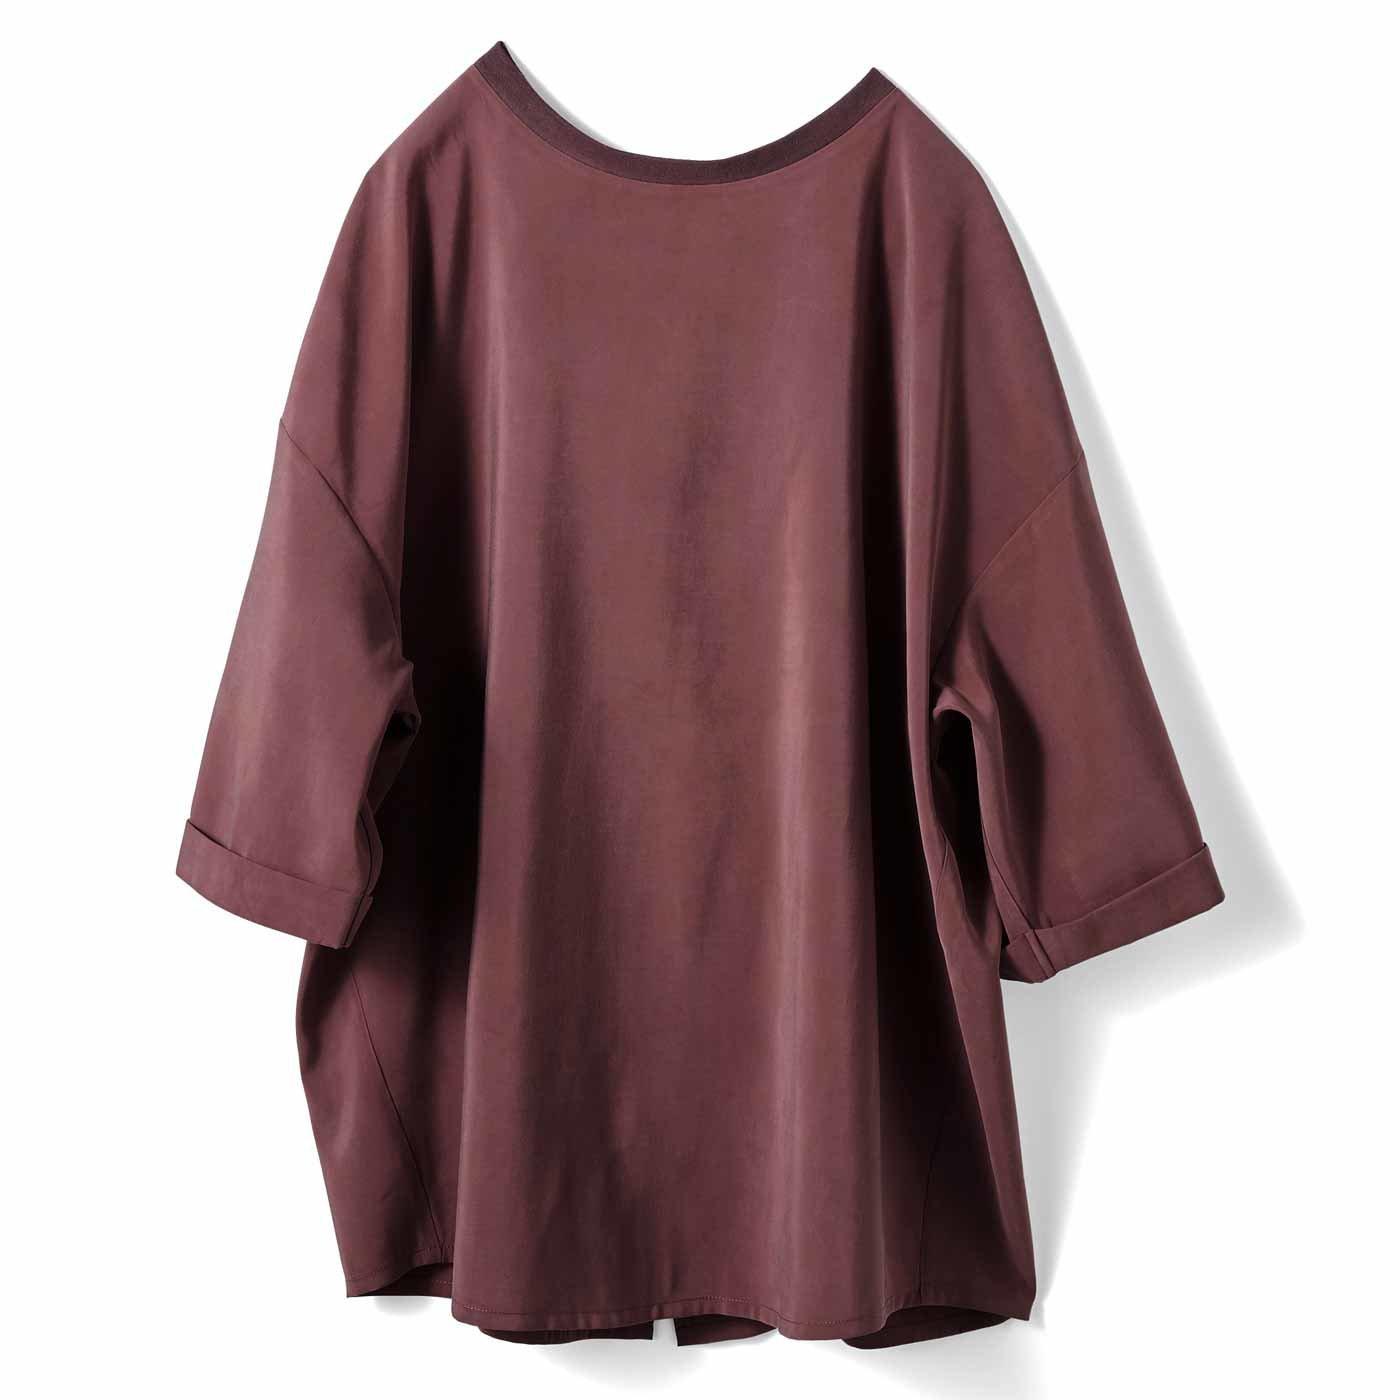 IEDIT[イディット] なめらか素材のTシャツみたいなカジュアルブラウス〈ローズブラウン〉